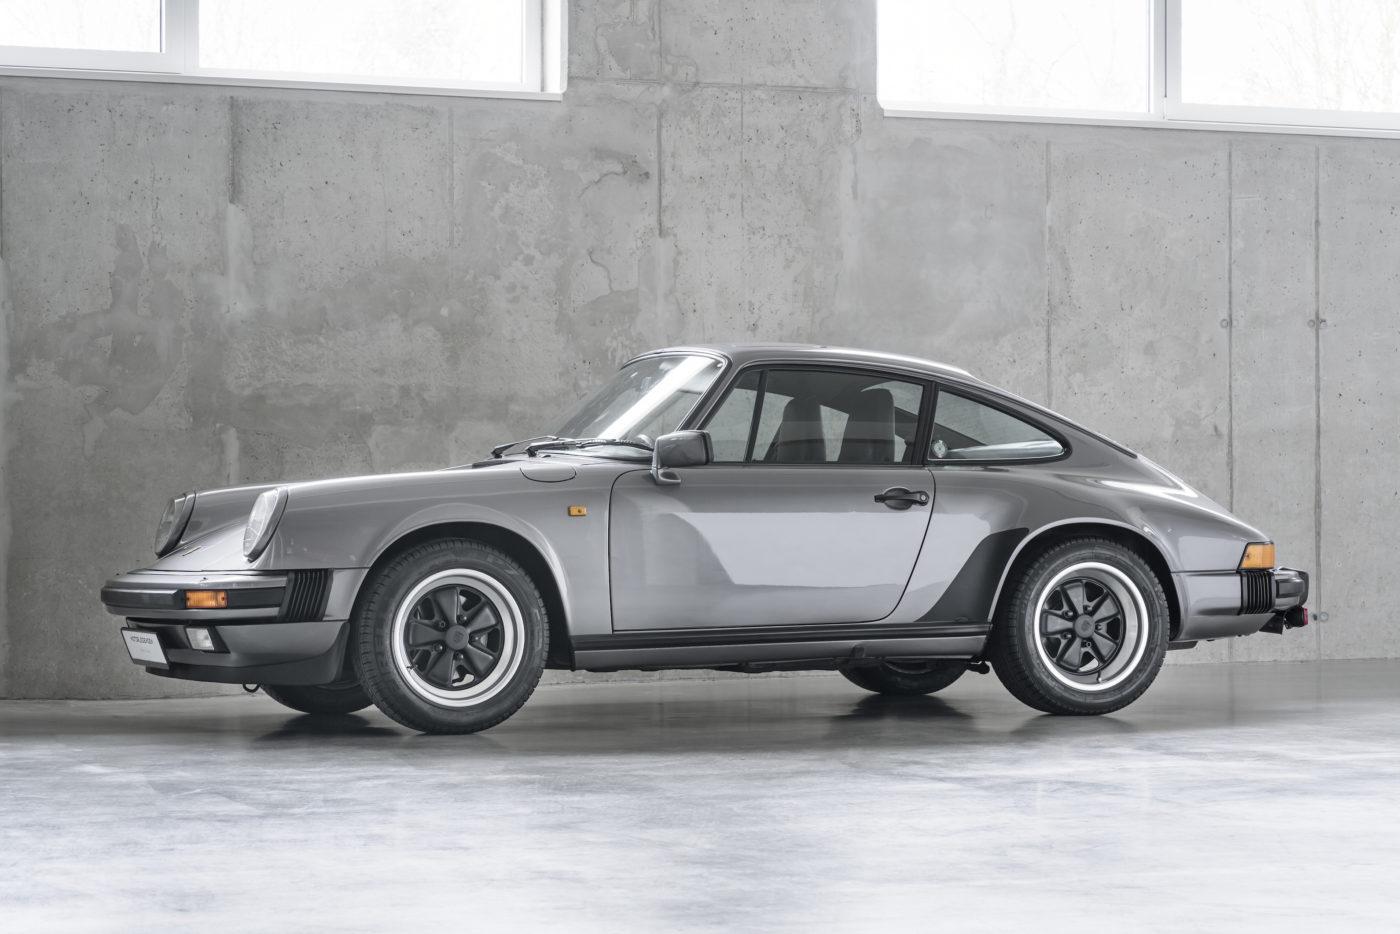 Buyer's guide – The Porsche 911 Carrera 3.2